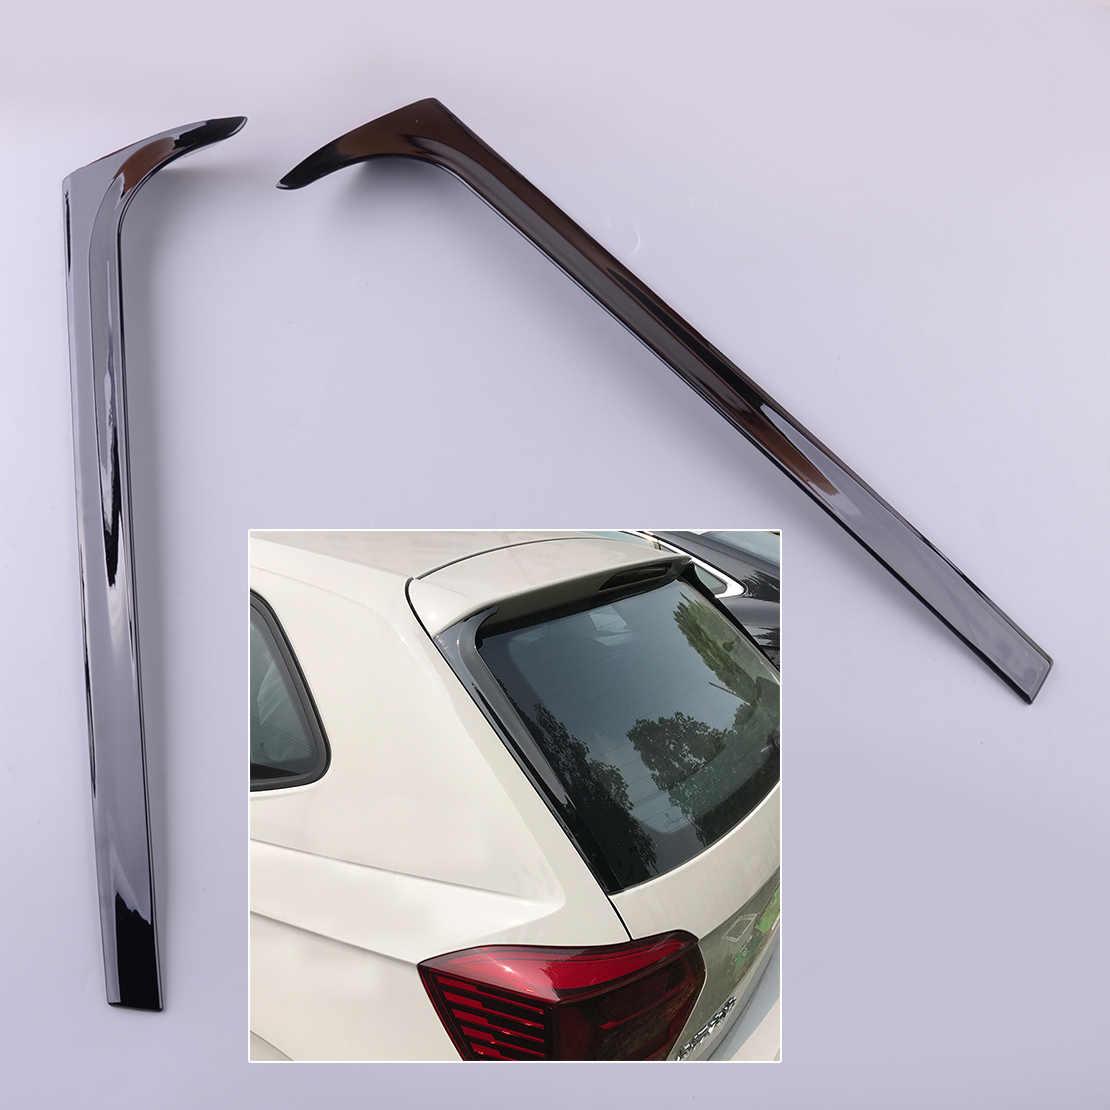 2X Rear Window Spoiler Side Wing Trim Cover For PoloMK6 2019-2020